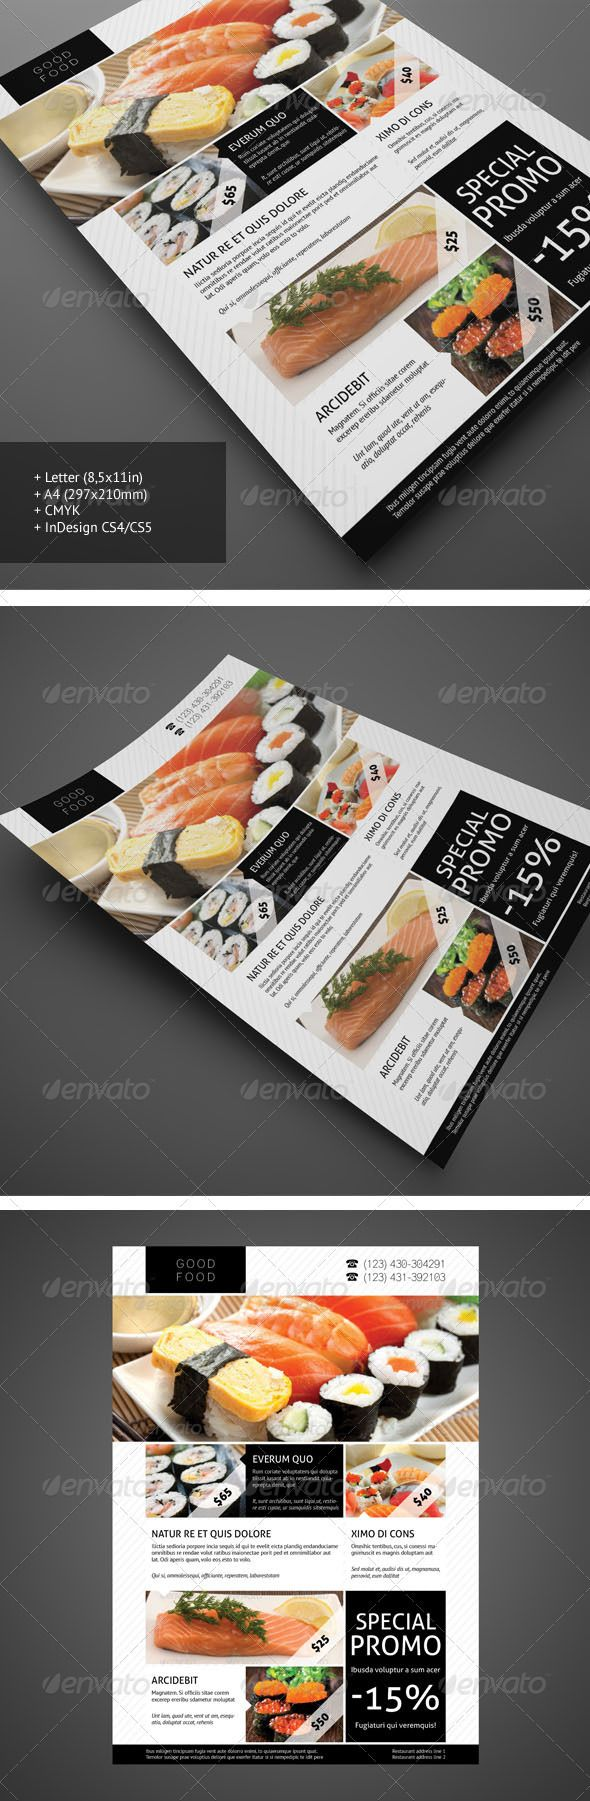 www.demorfoza.com Flyer design inspiration #restaurant #flyer #template